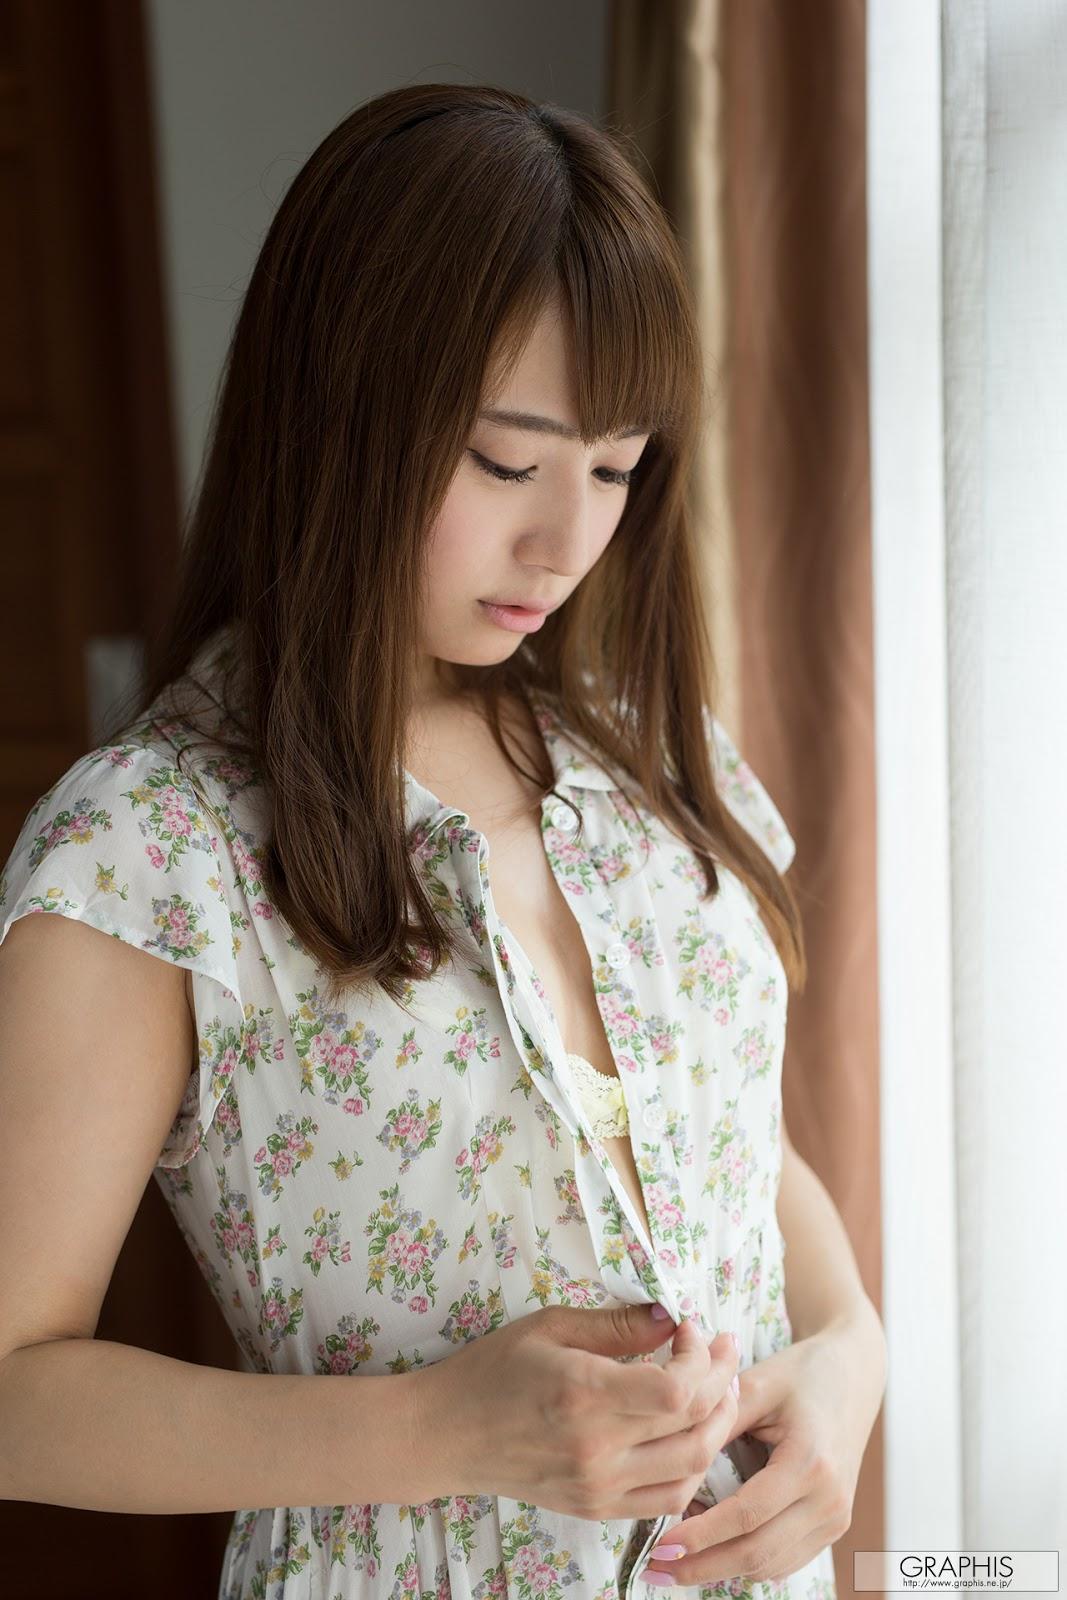 Graphis Gals No378 Minami Hatsukawa  Ladylike -8183